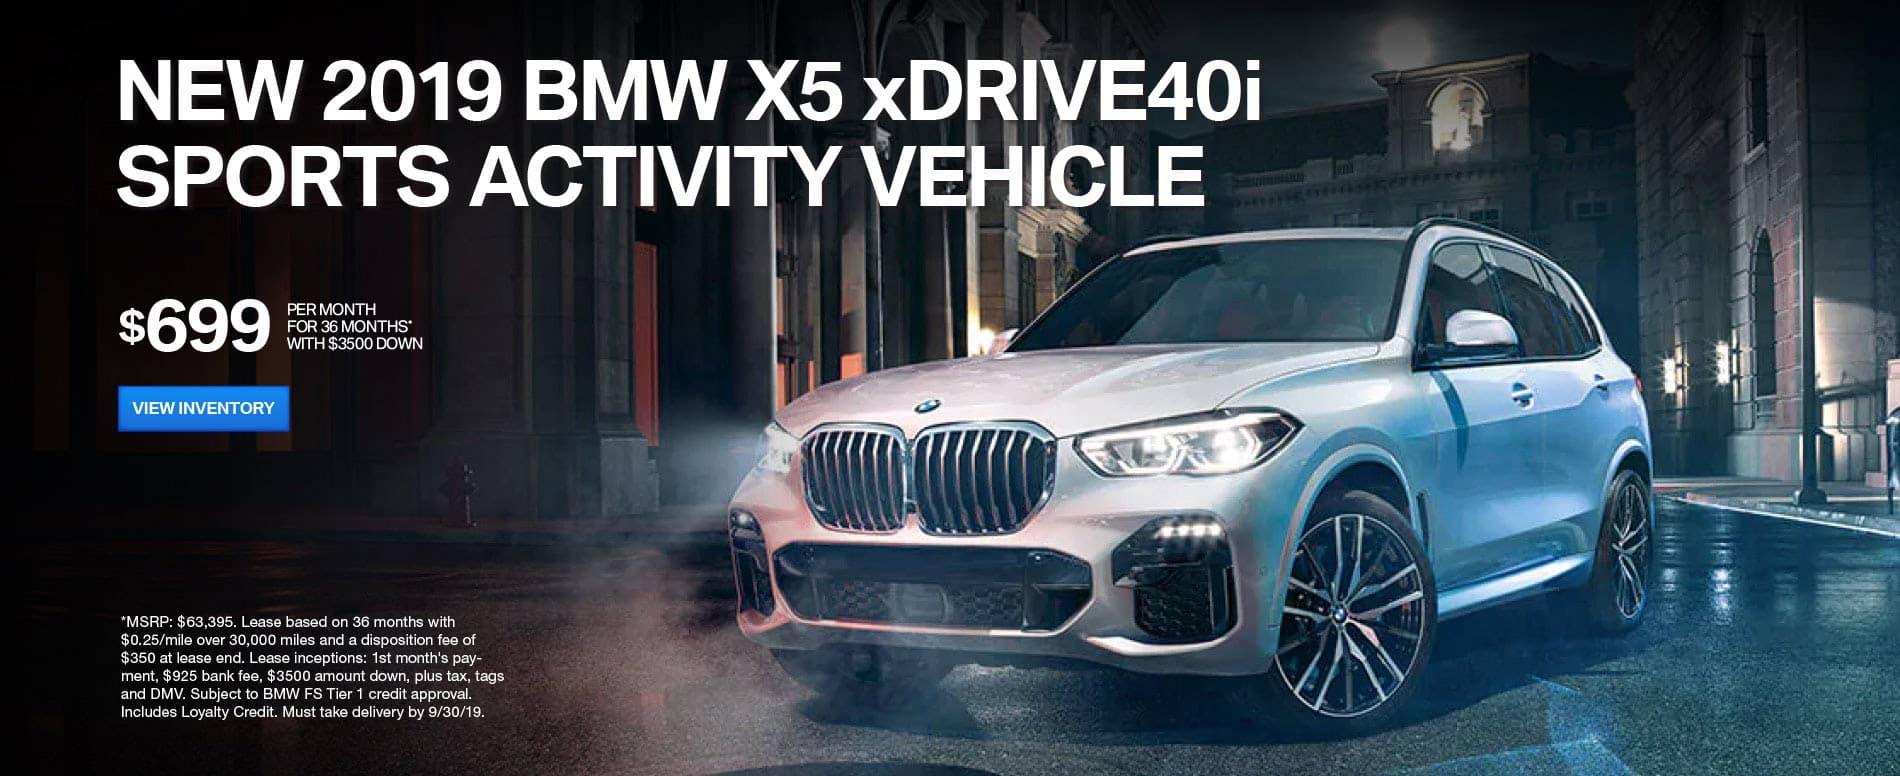 2019 BMW X5 XDRIVE 40i sports activity vehicle